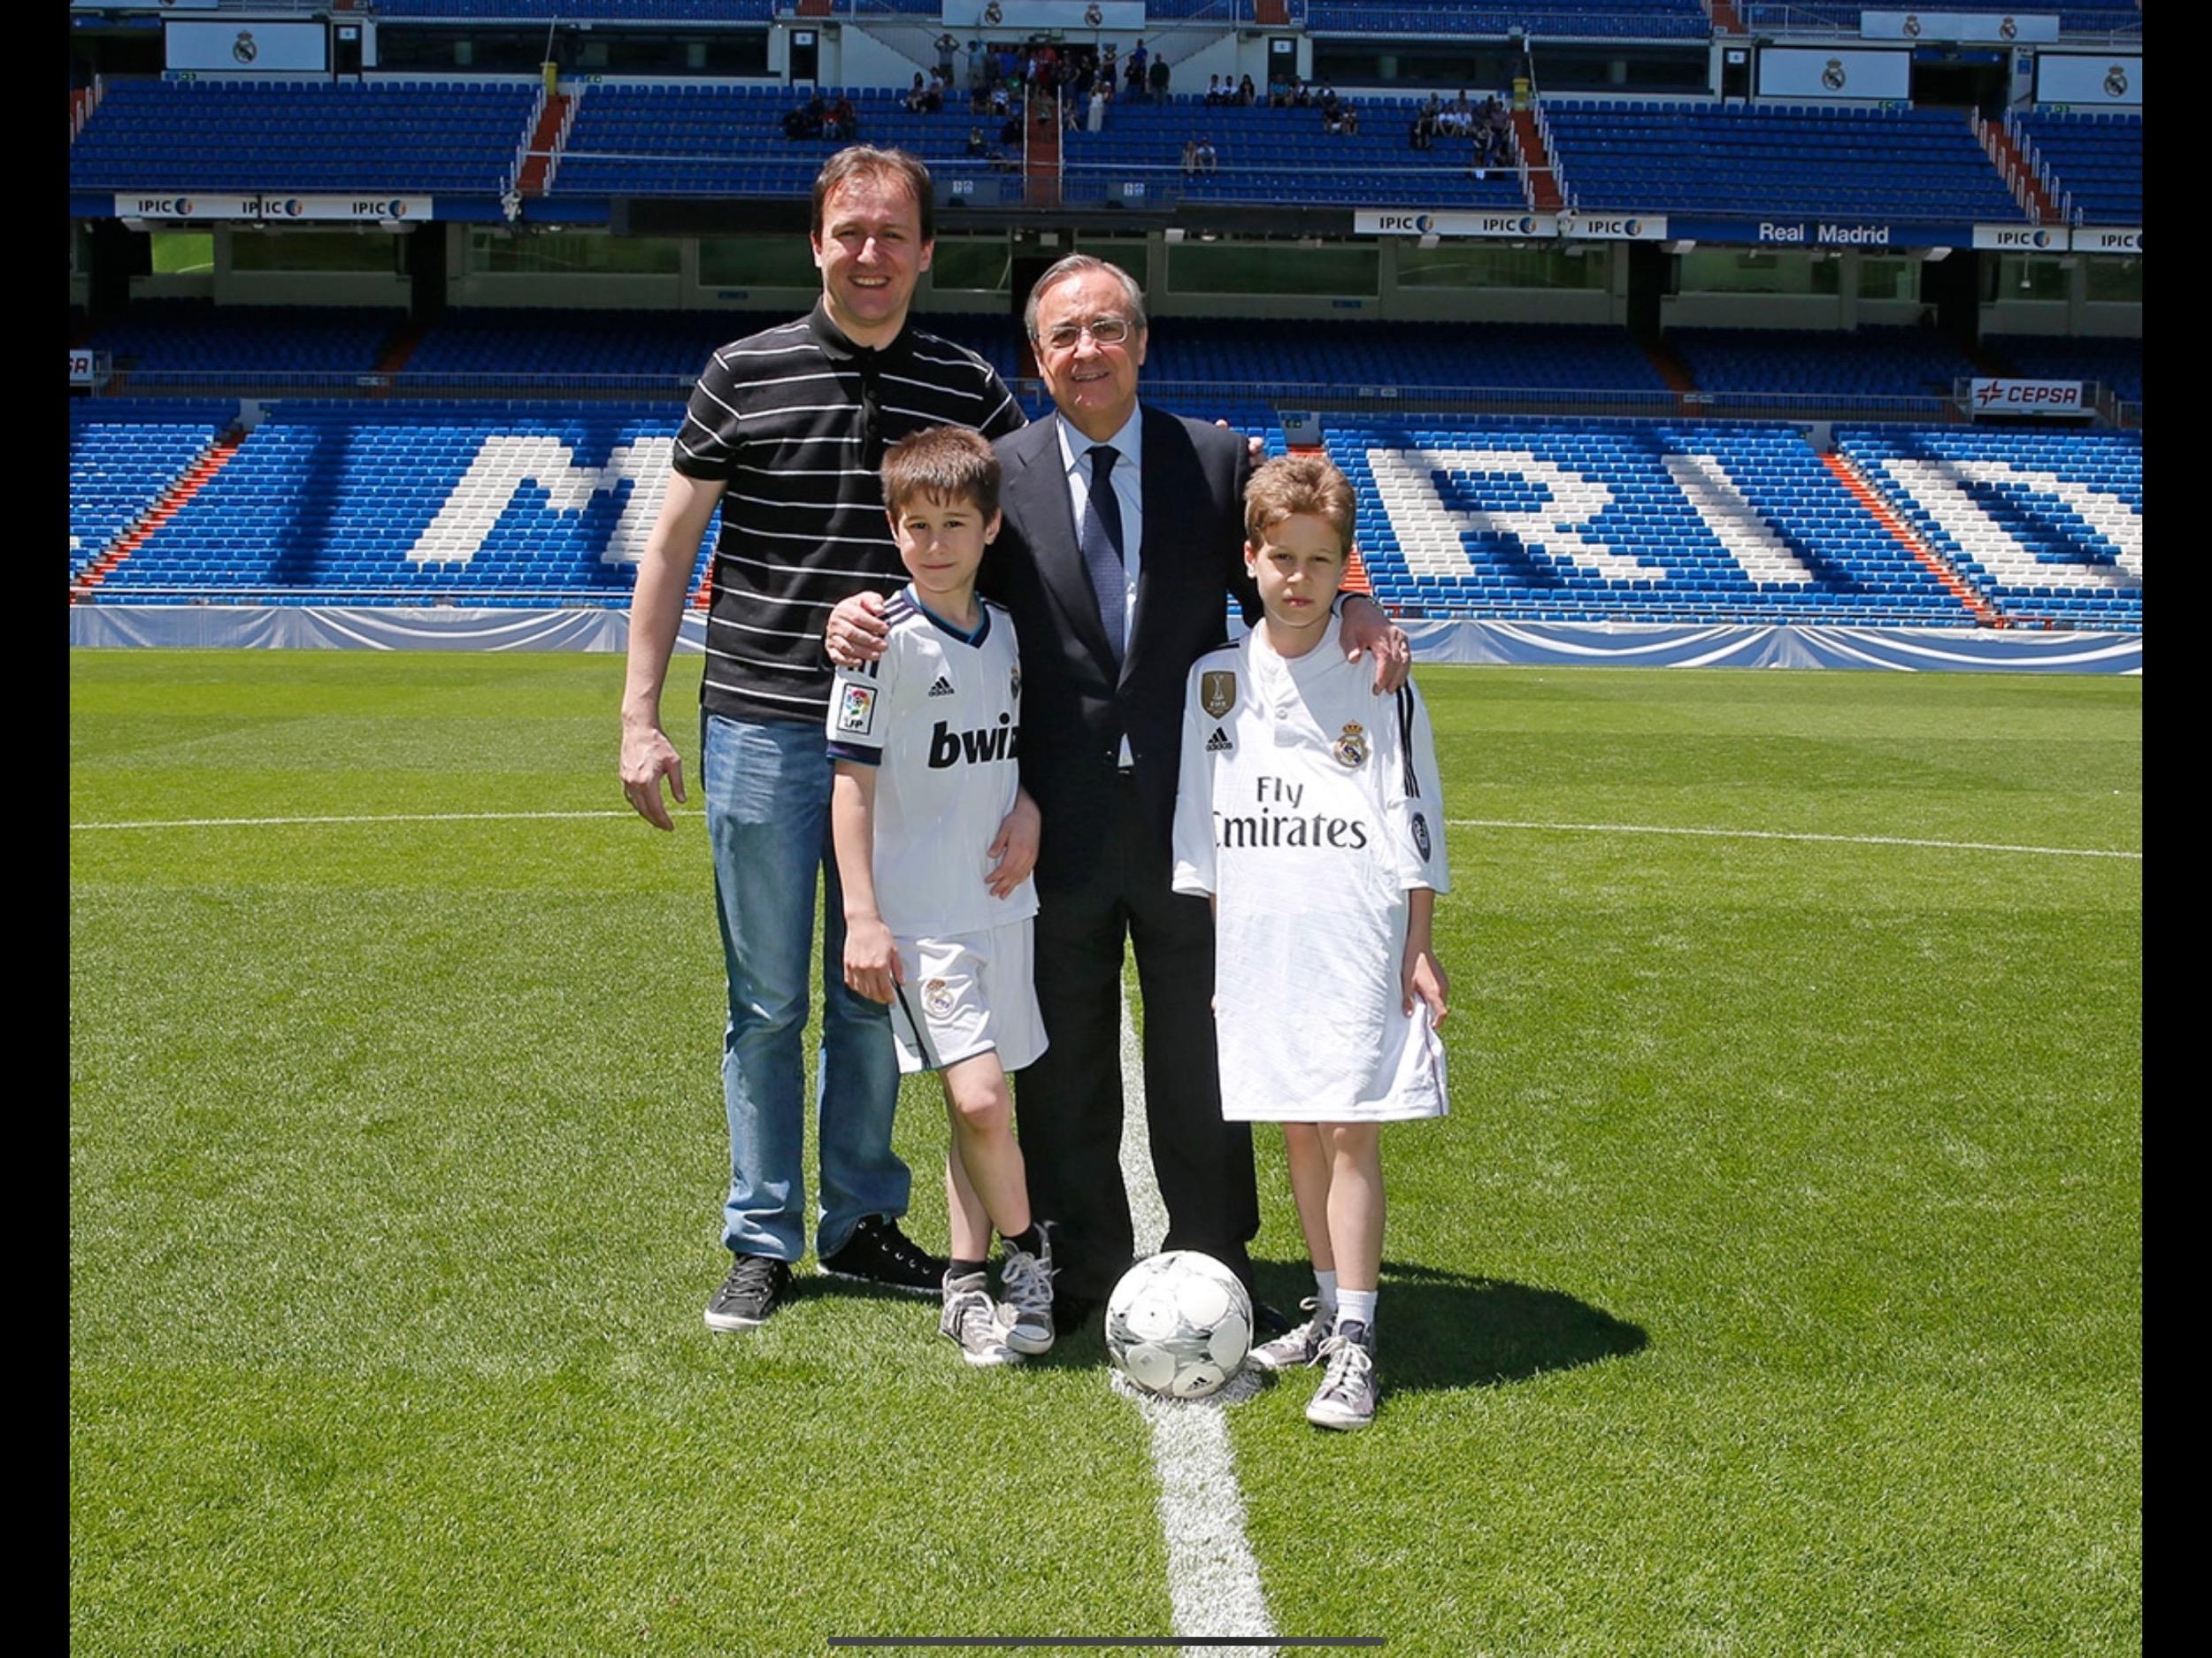 Florentino Perez reizabran za predsednika Real Madrida